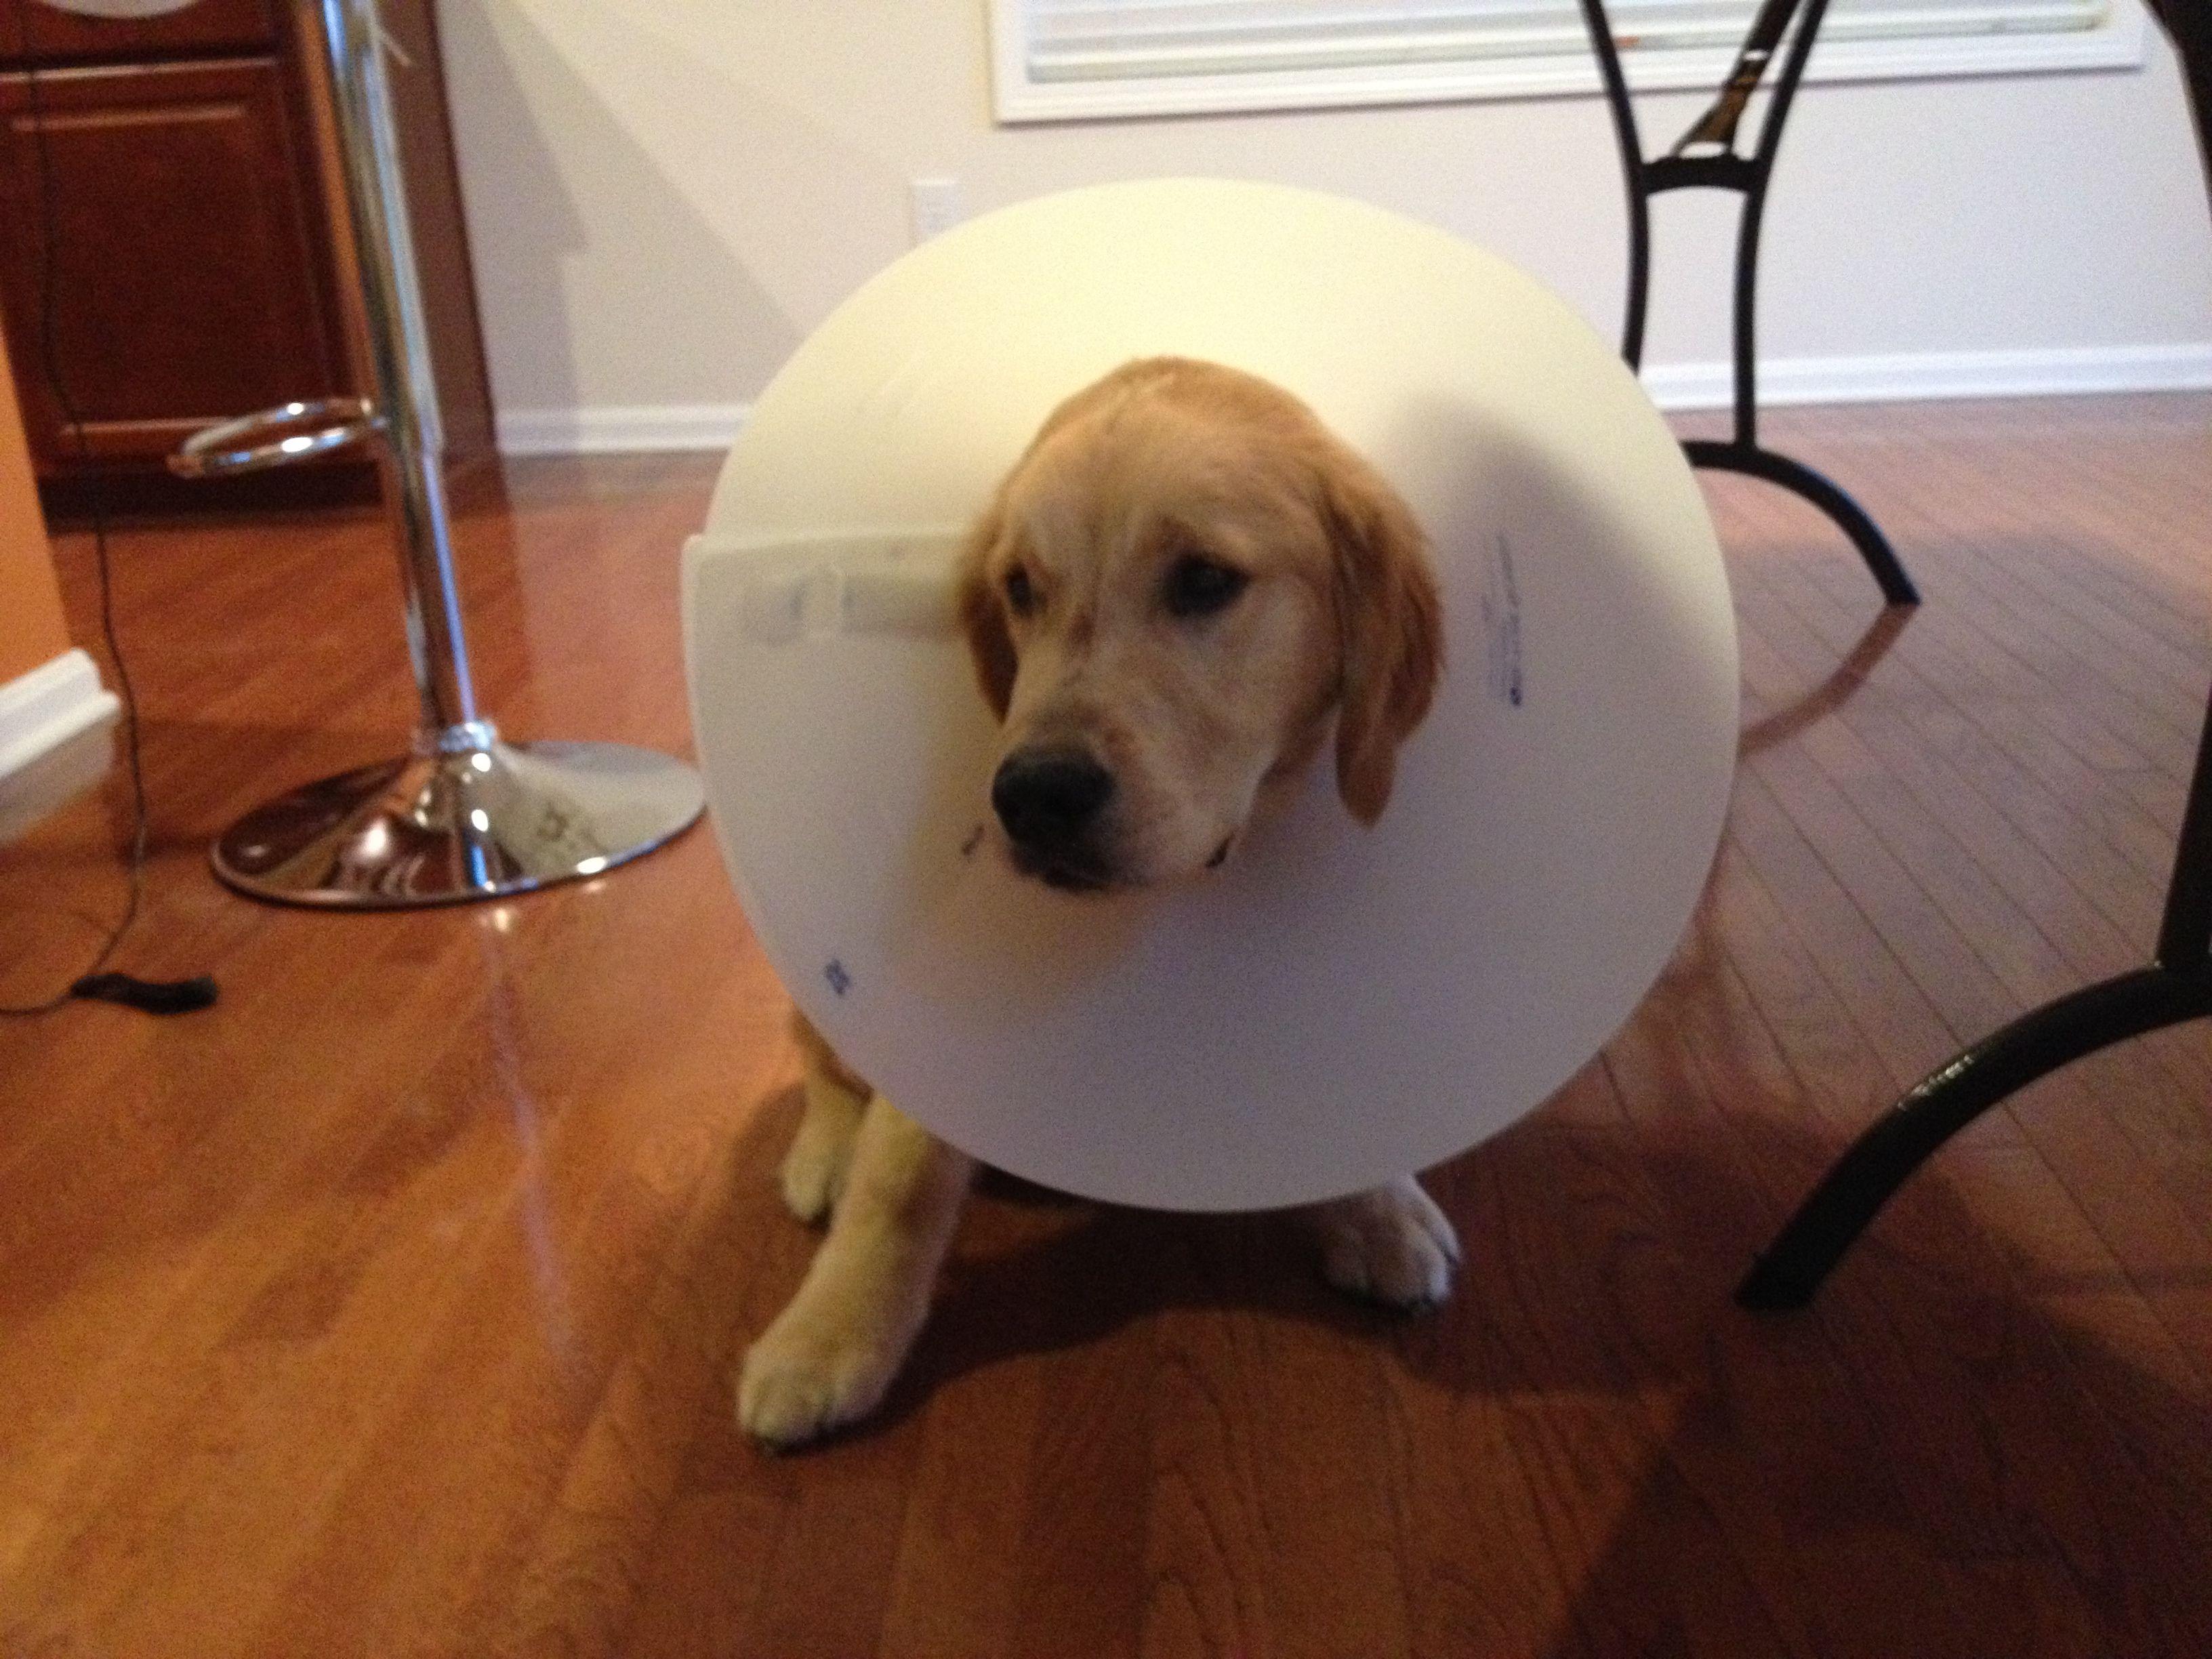 Cone of shame.